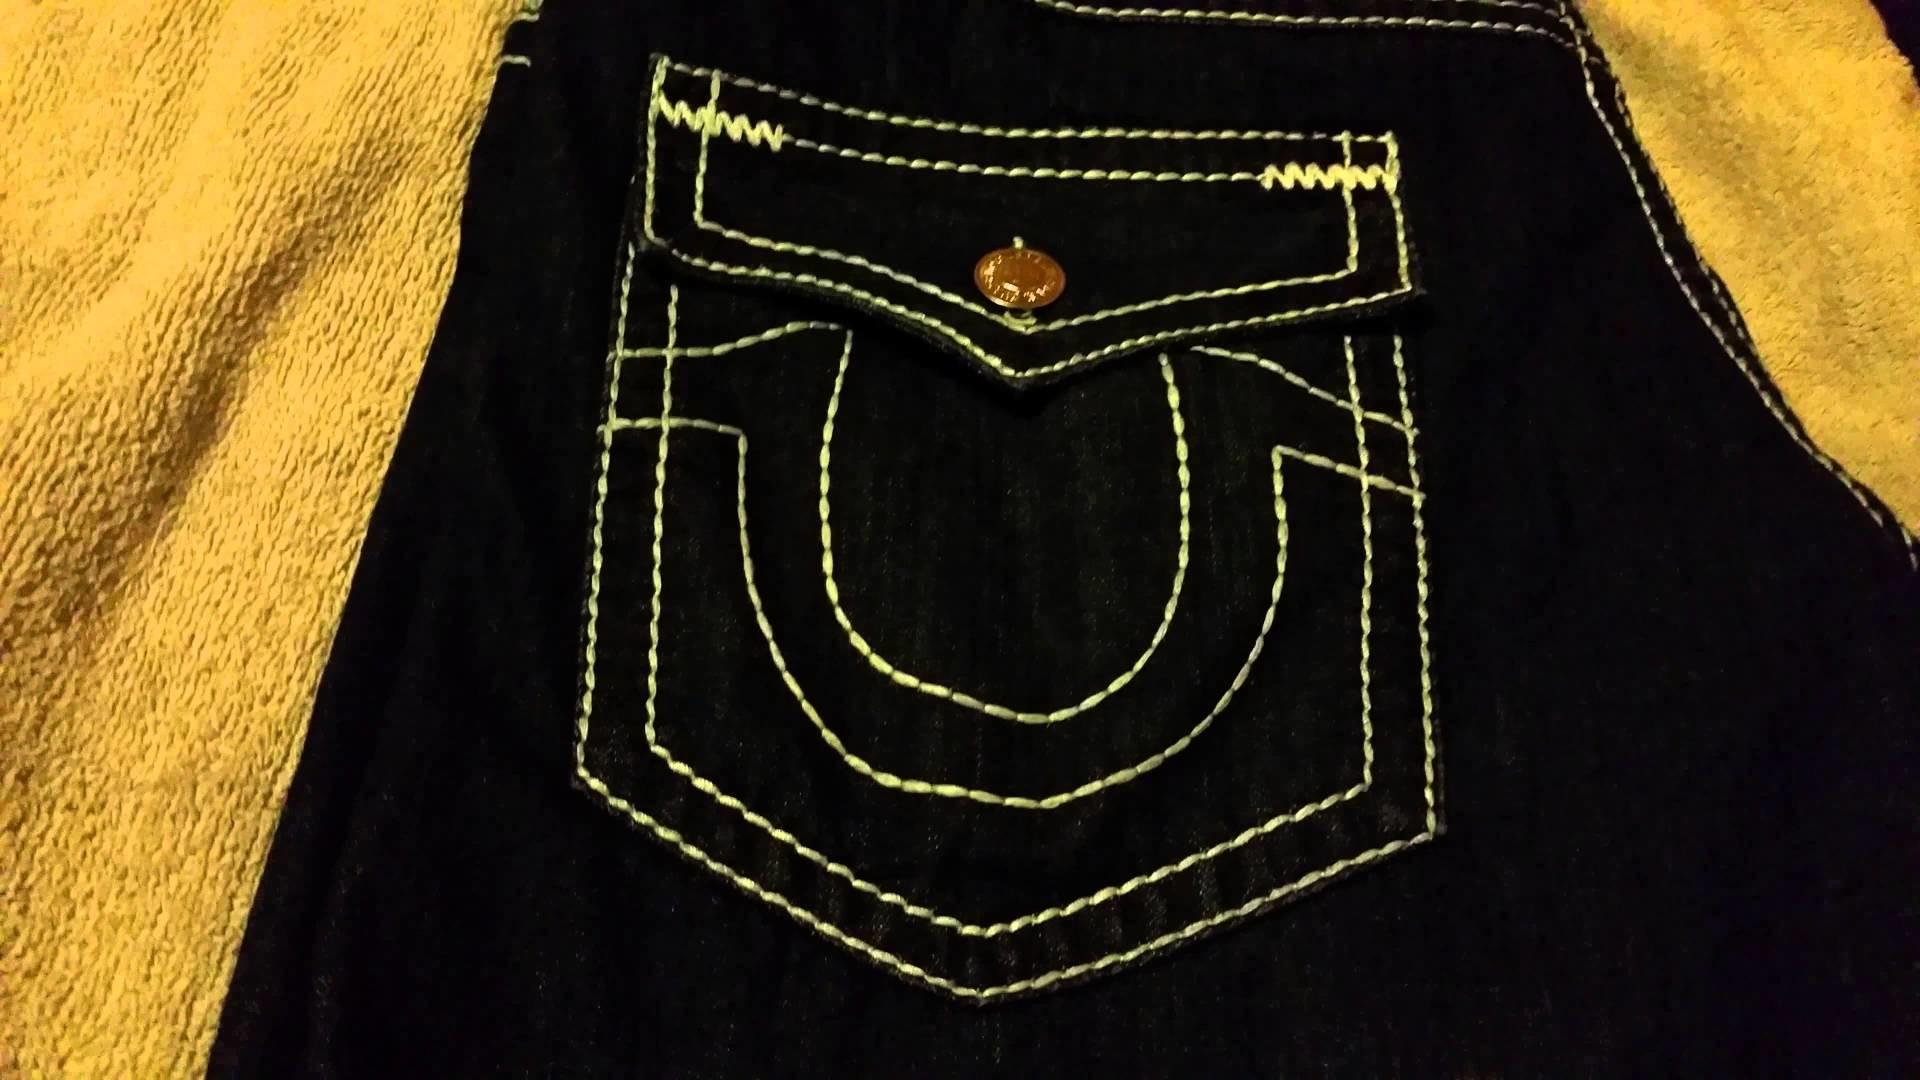 Sirkicks.cn AAA True Religion jeans